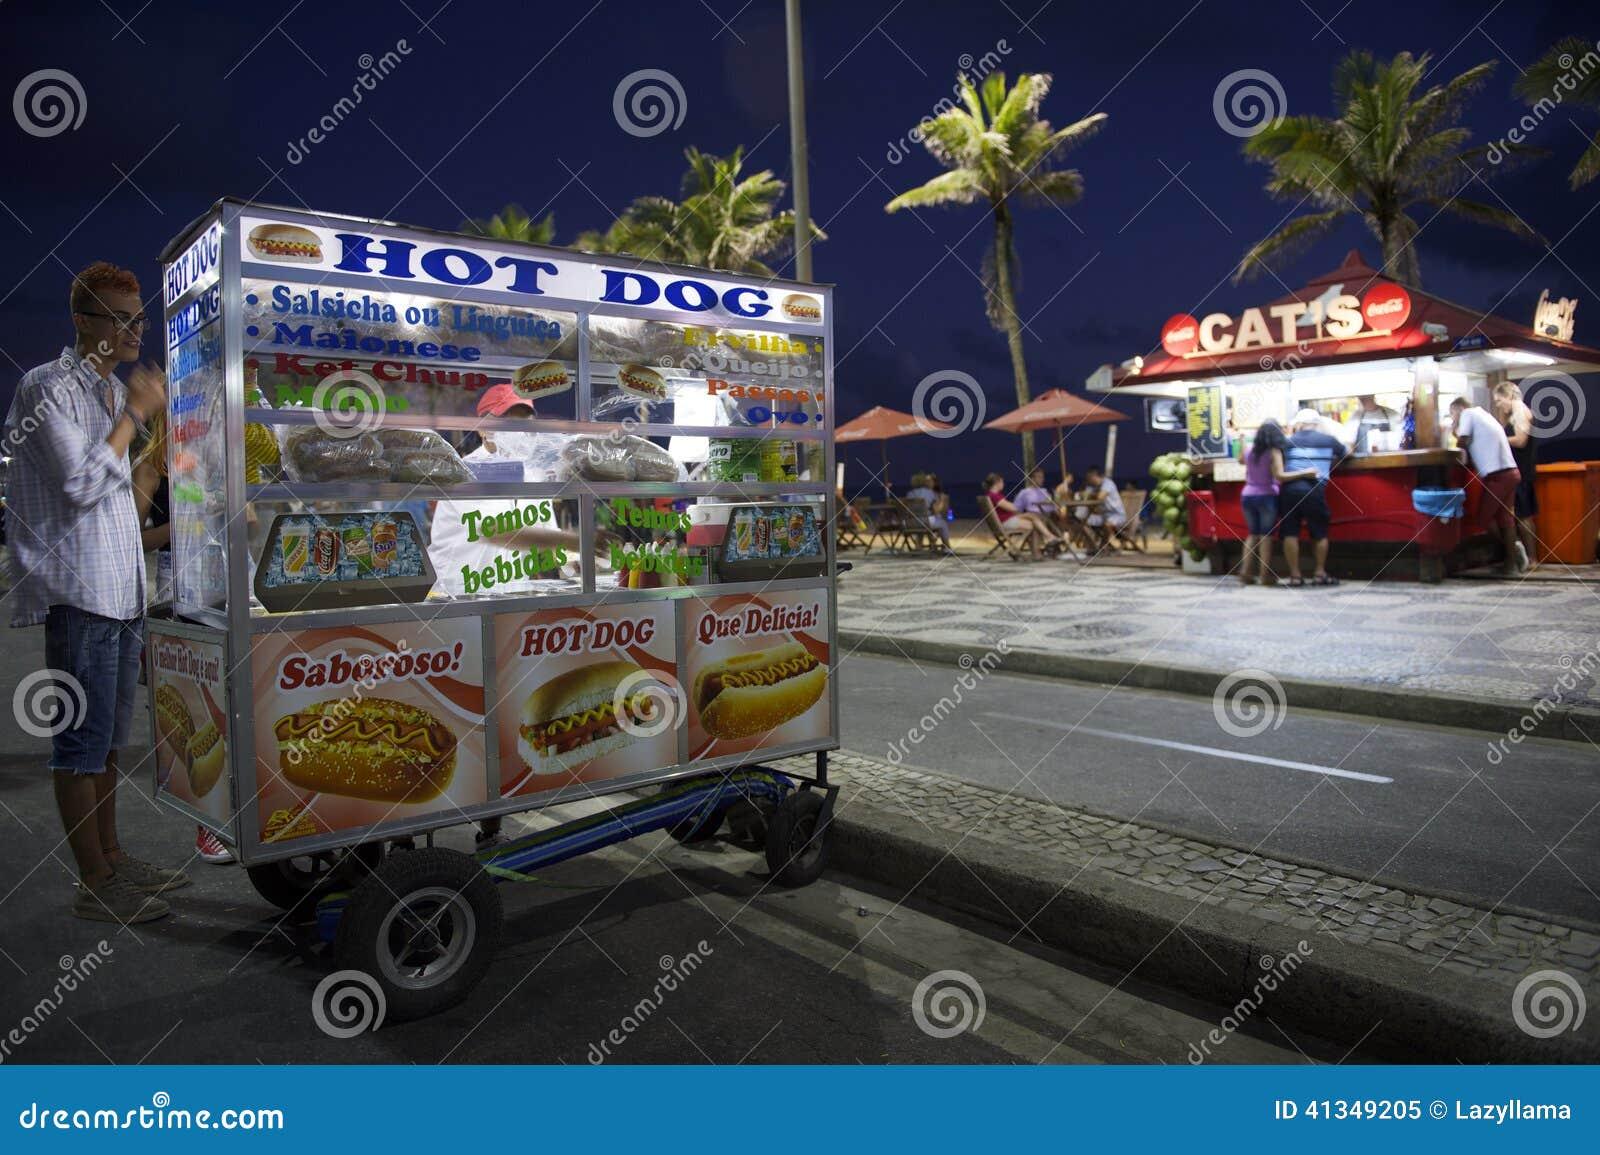 Hot Dog Cart Plans Free